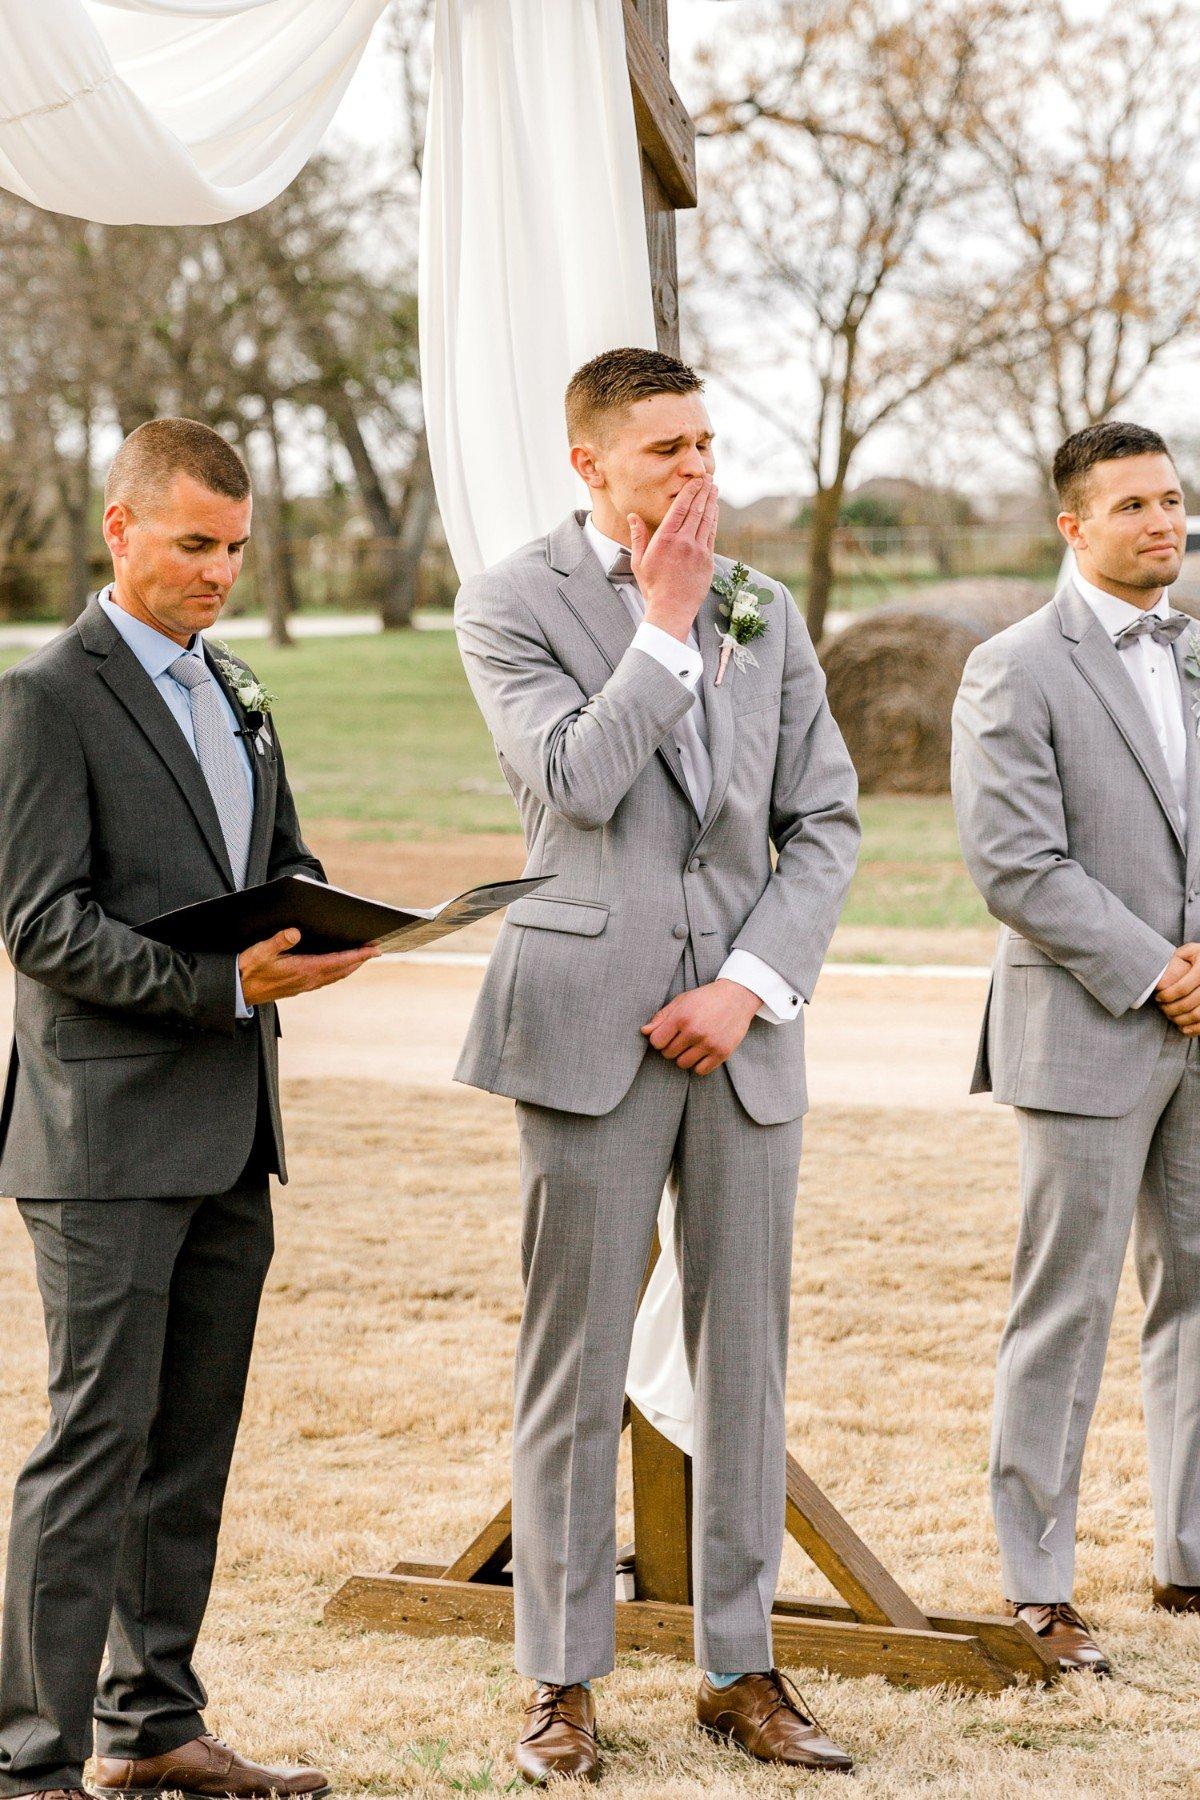 ennis-texas-wedding-photographer-kaitlyn-bullard-66.jpg